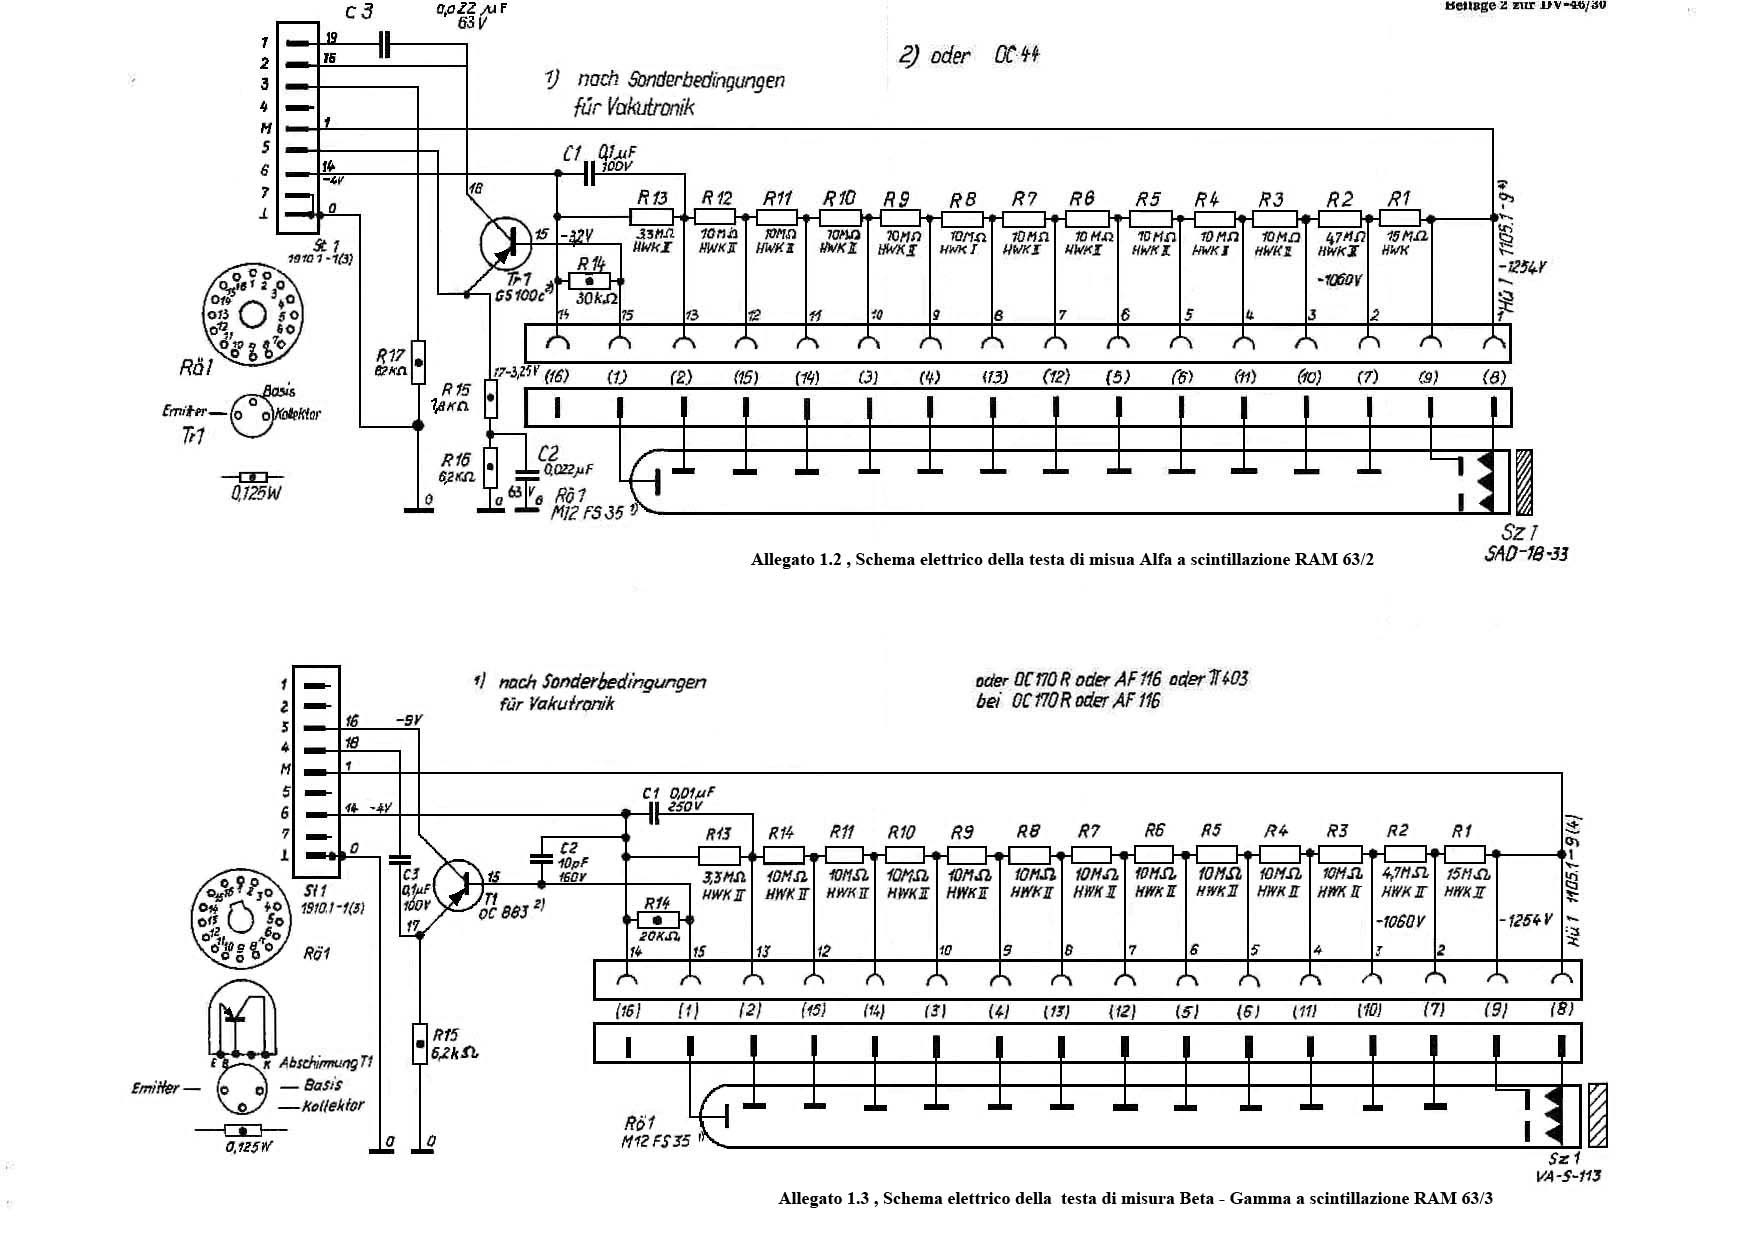 RAM 63 geiger Counter miglioramenti by Roberto Chirio